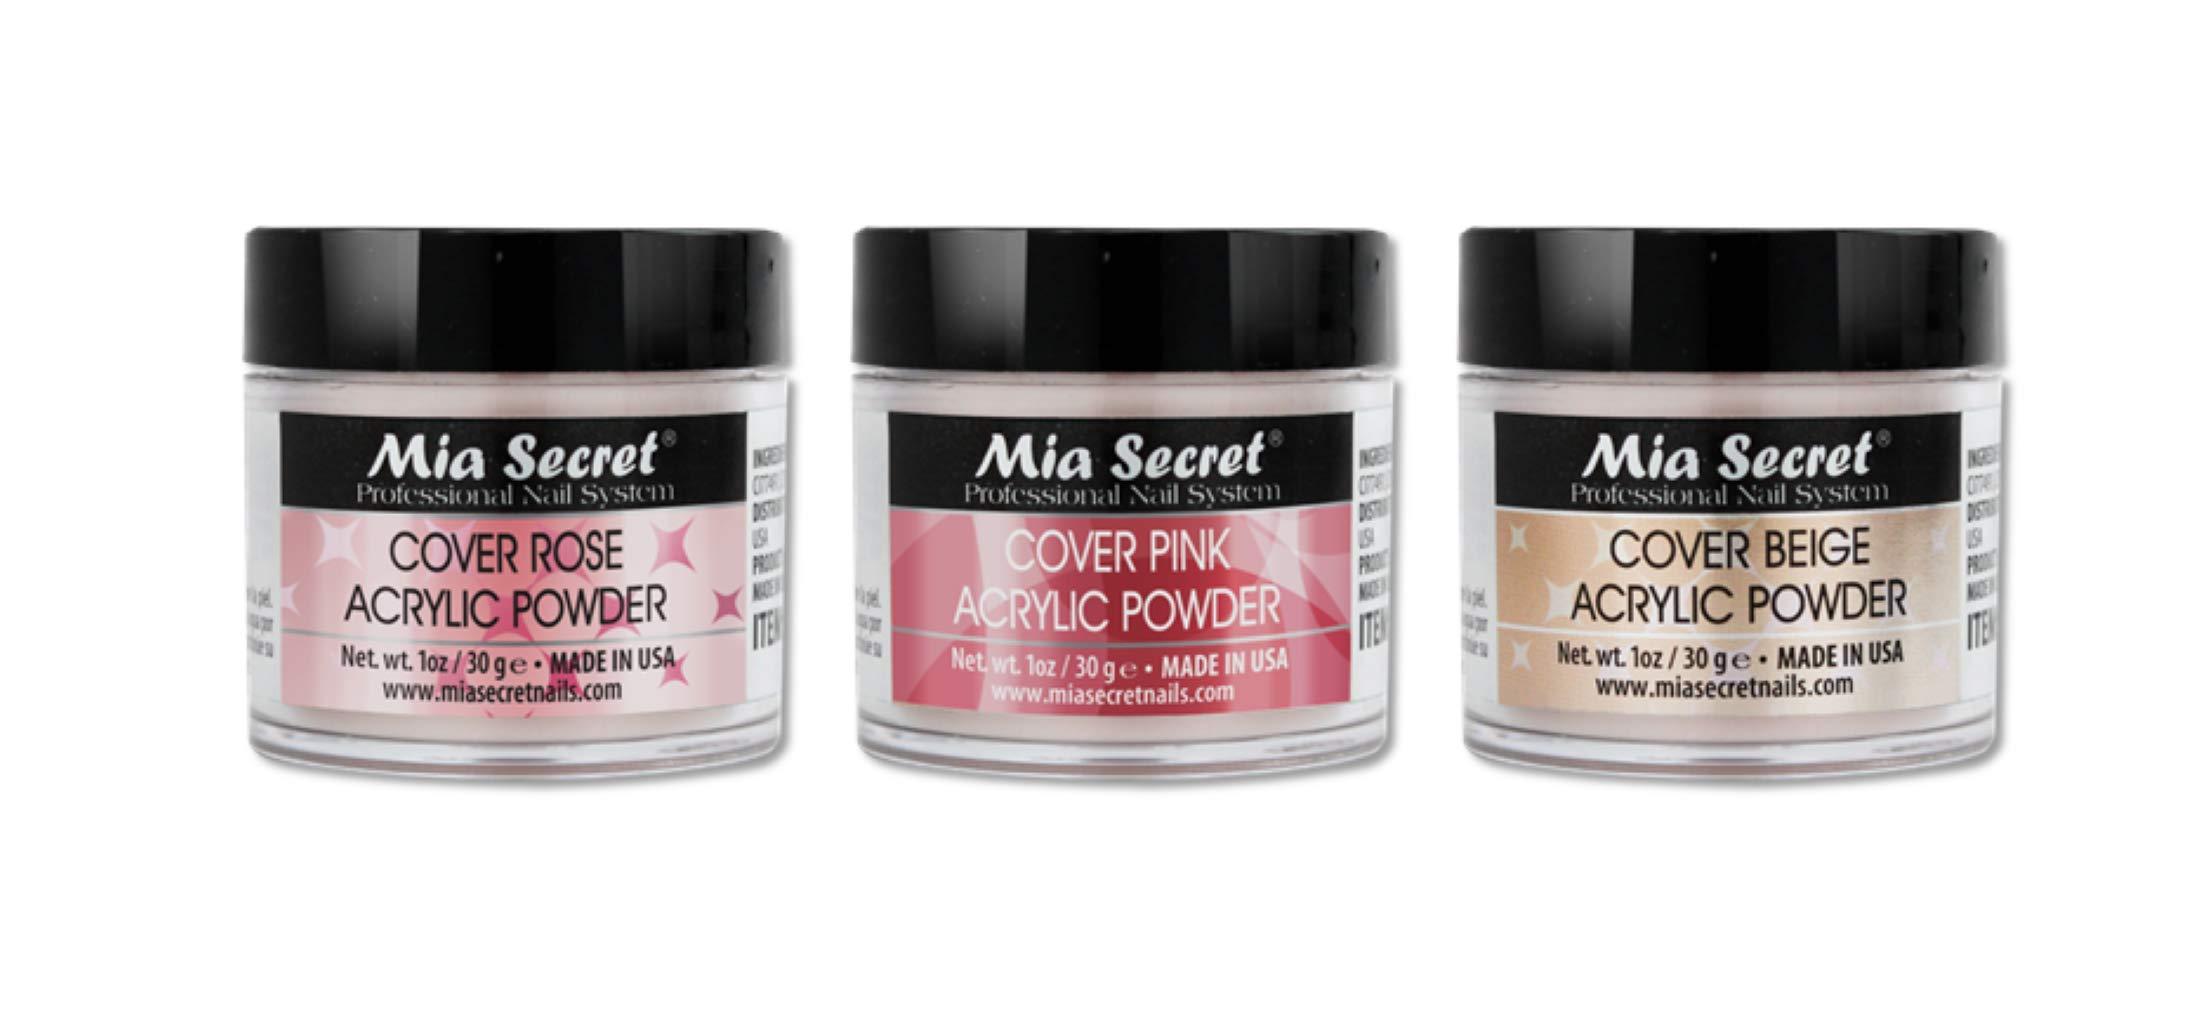 MIA Secret Cover Powder 3 Pc Set - Pink/Beige/Rose 1.0 Oz